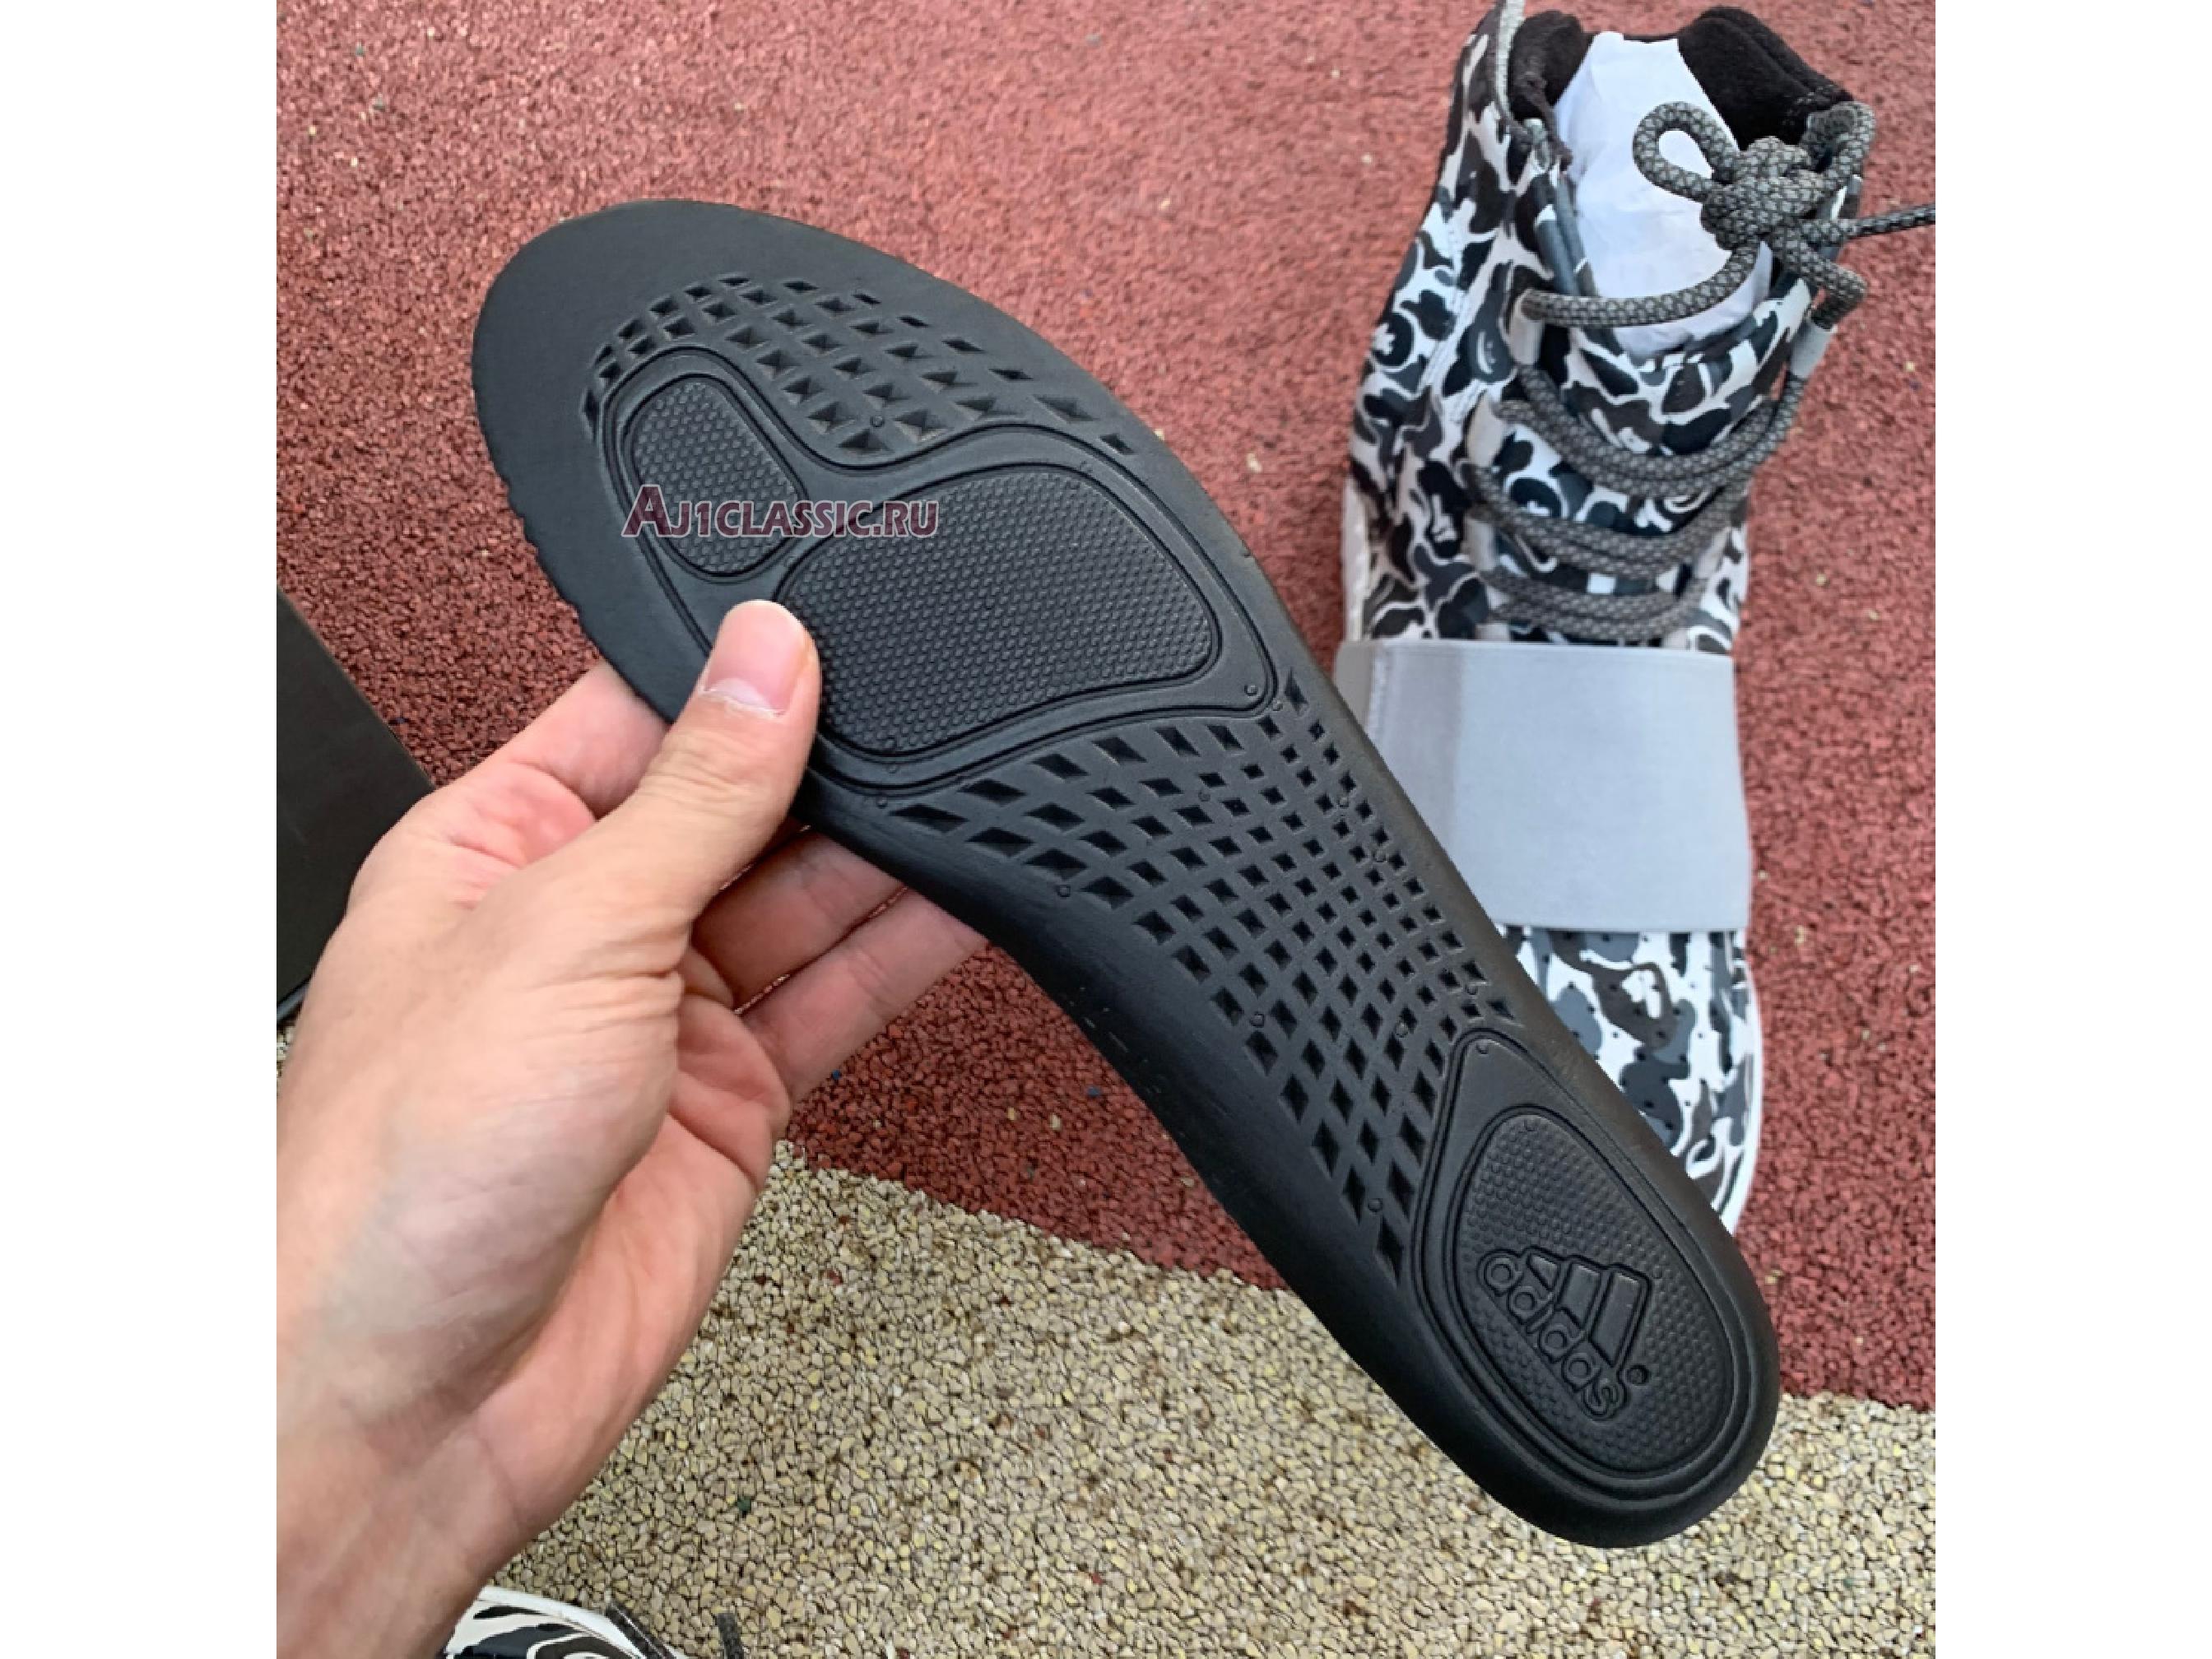 Adidas Yeezy Boost 750 x A Bathing Bape In Lukewarm Water JW5354